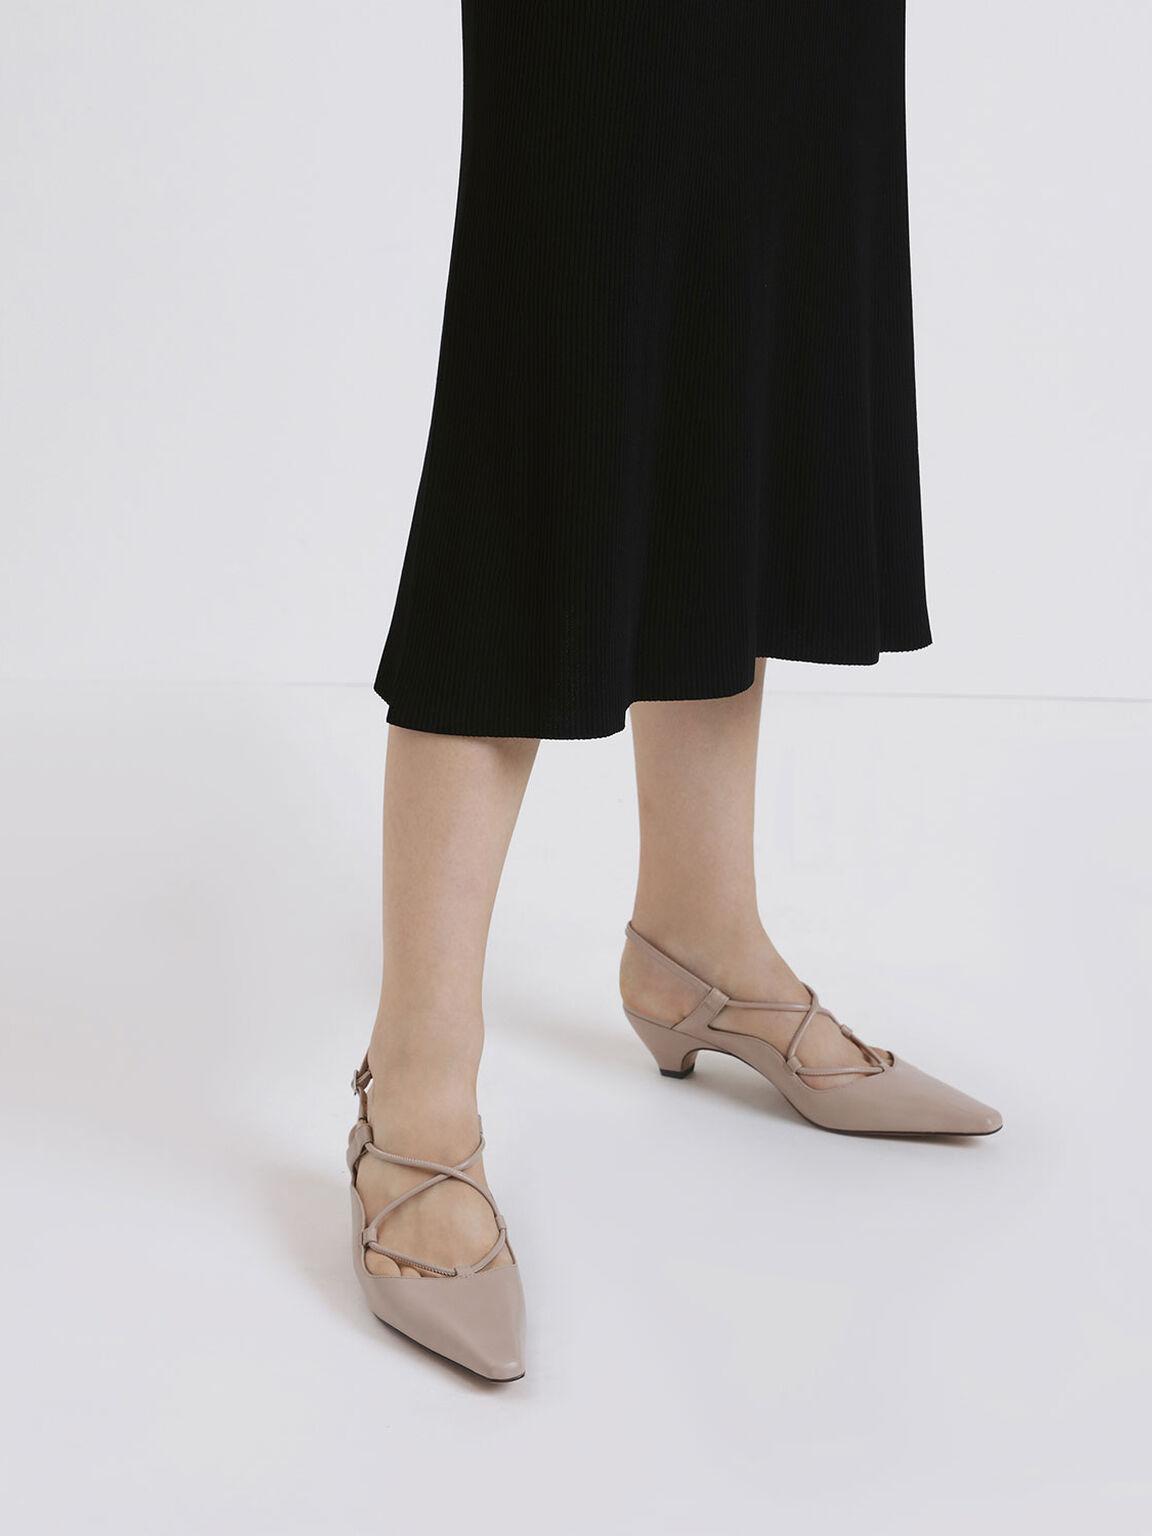 Criss Cross Slingback Kitten Block Heels, Nude, hi-res